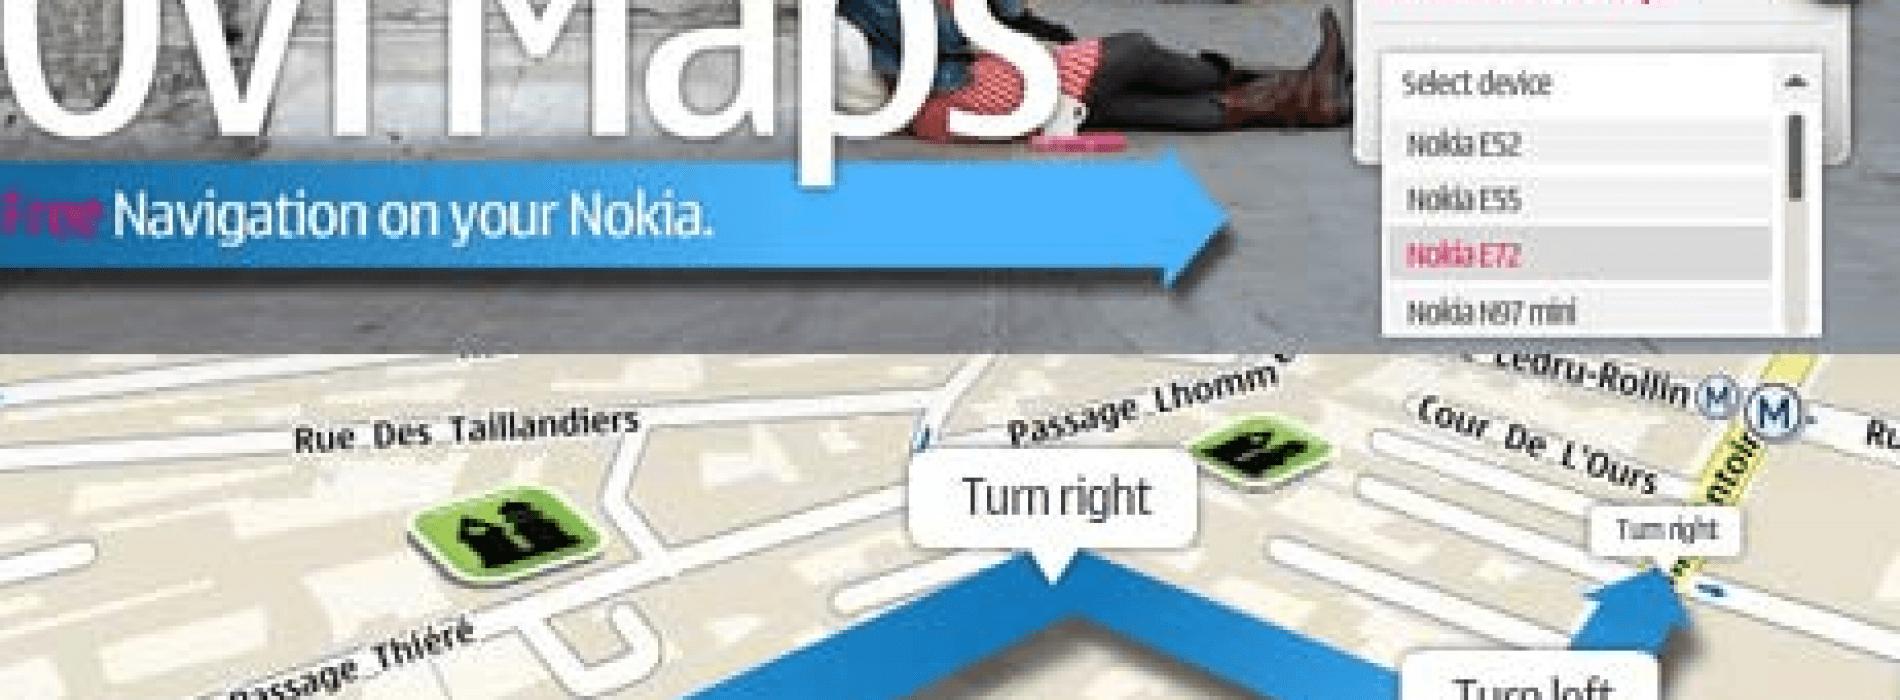 Nokia regala OVI Maps